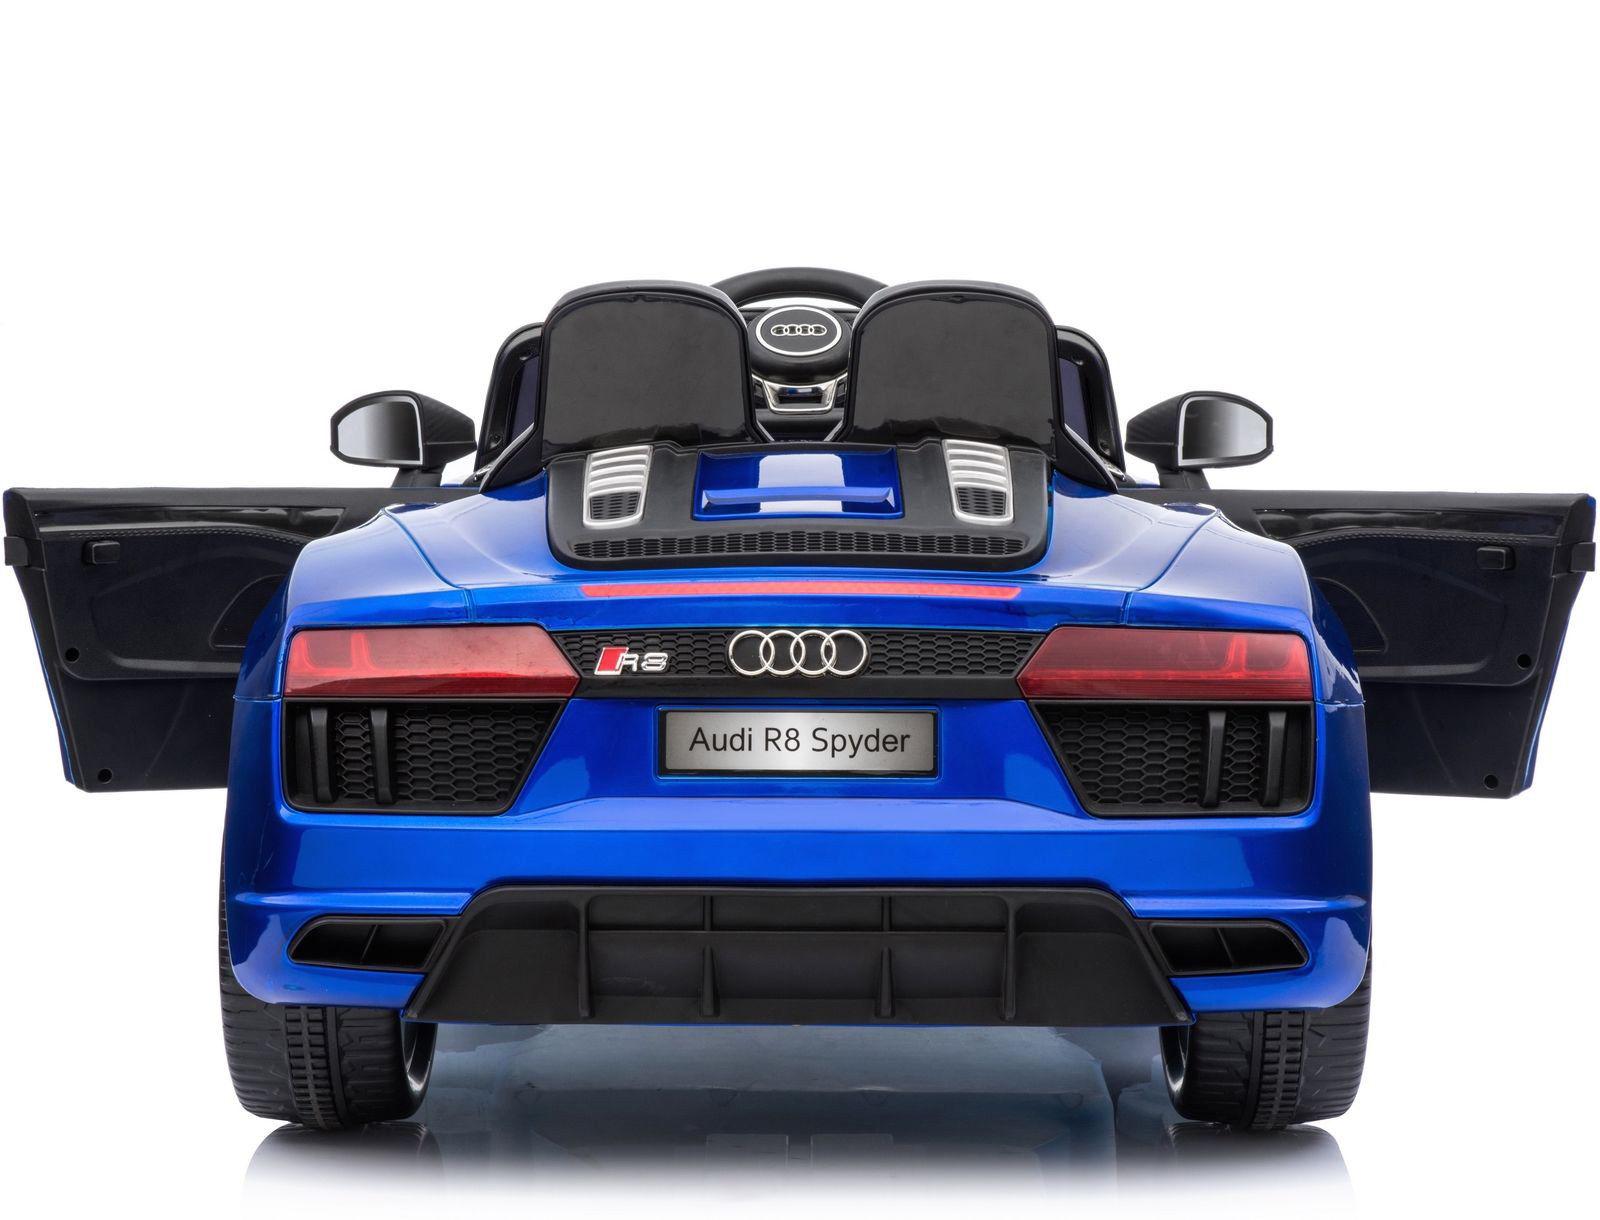 Coche electrico para niños Audi Little R8 Spyder Azul 2